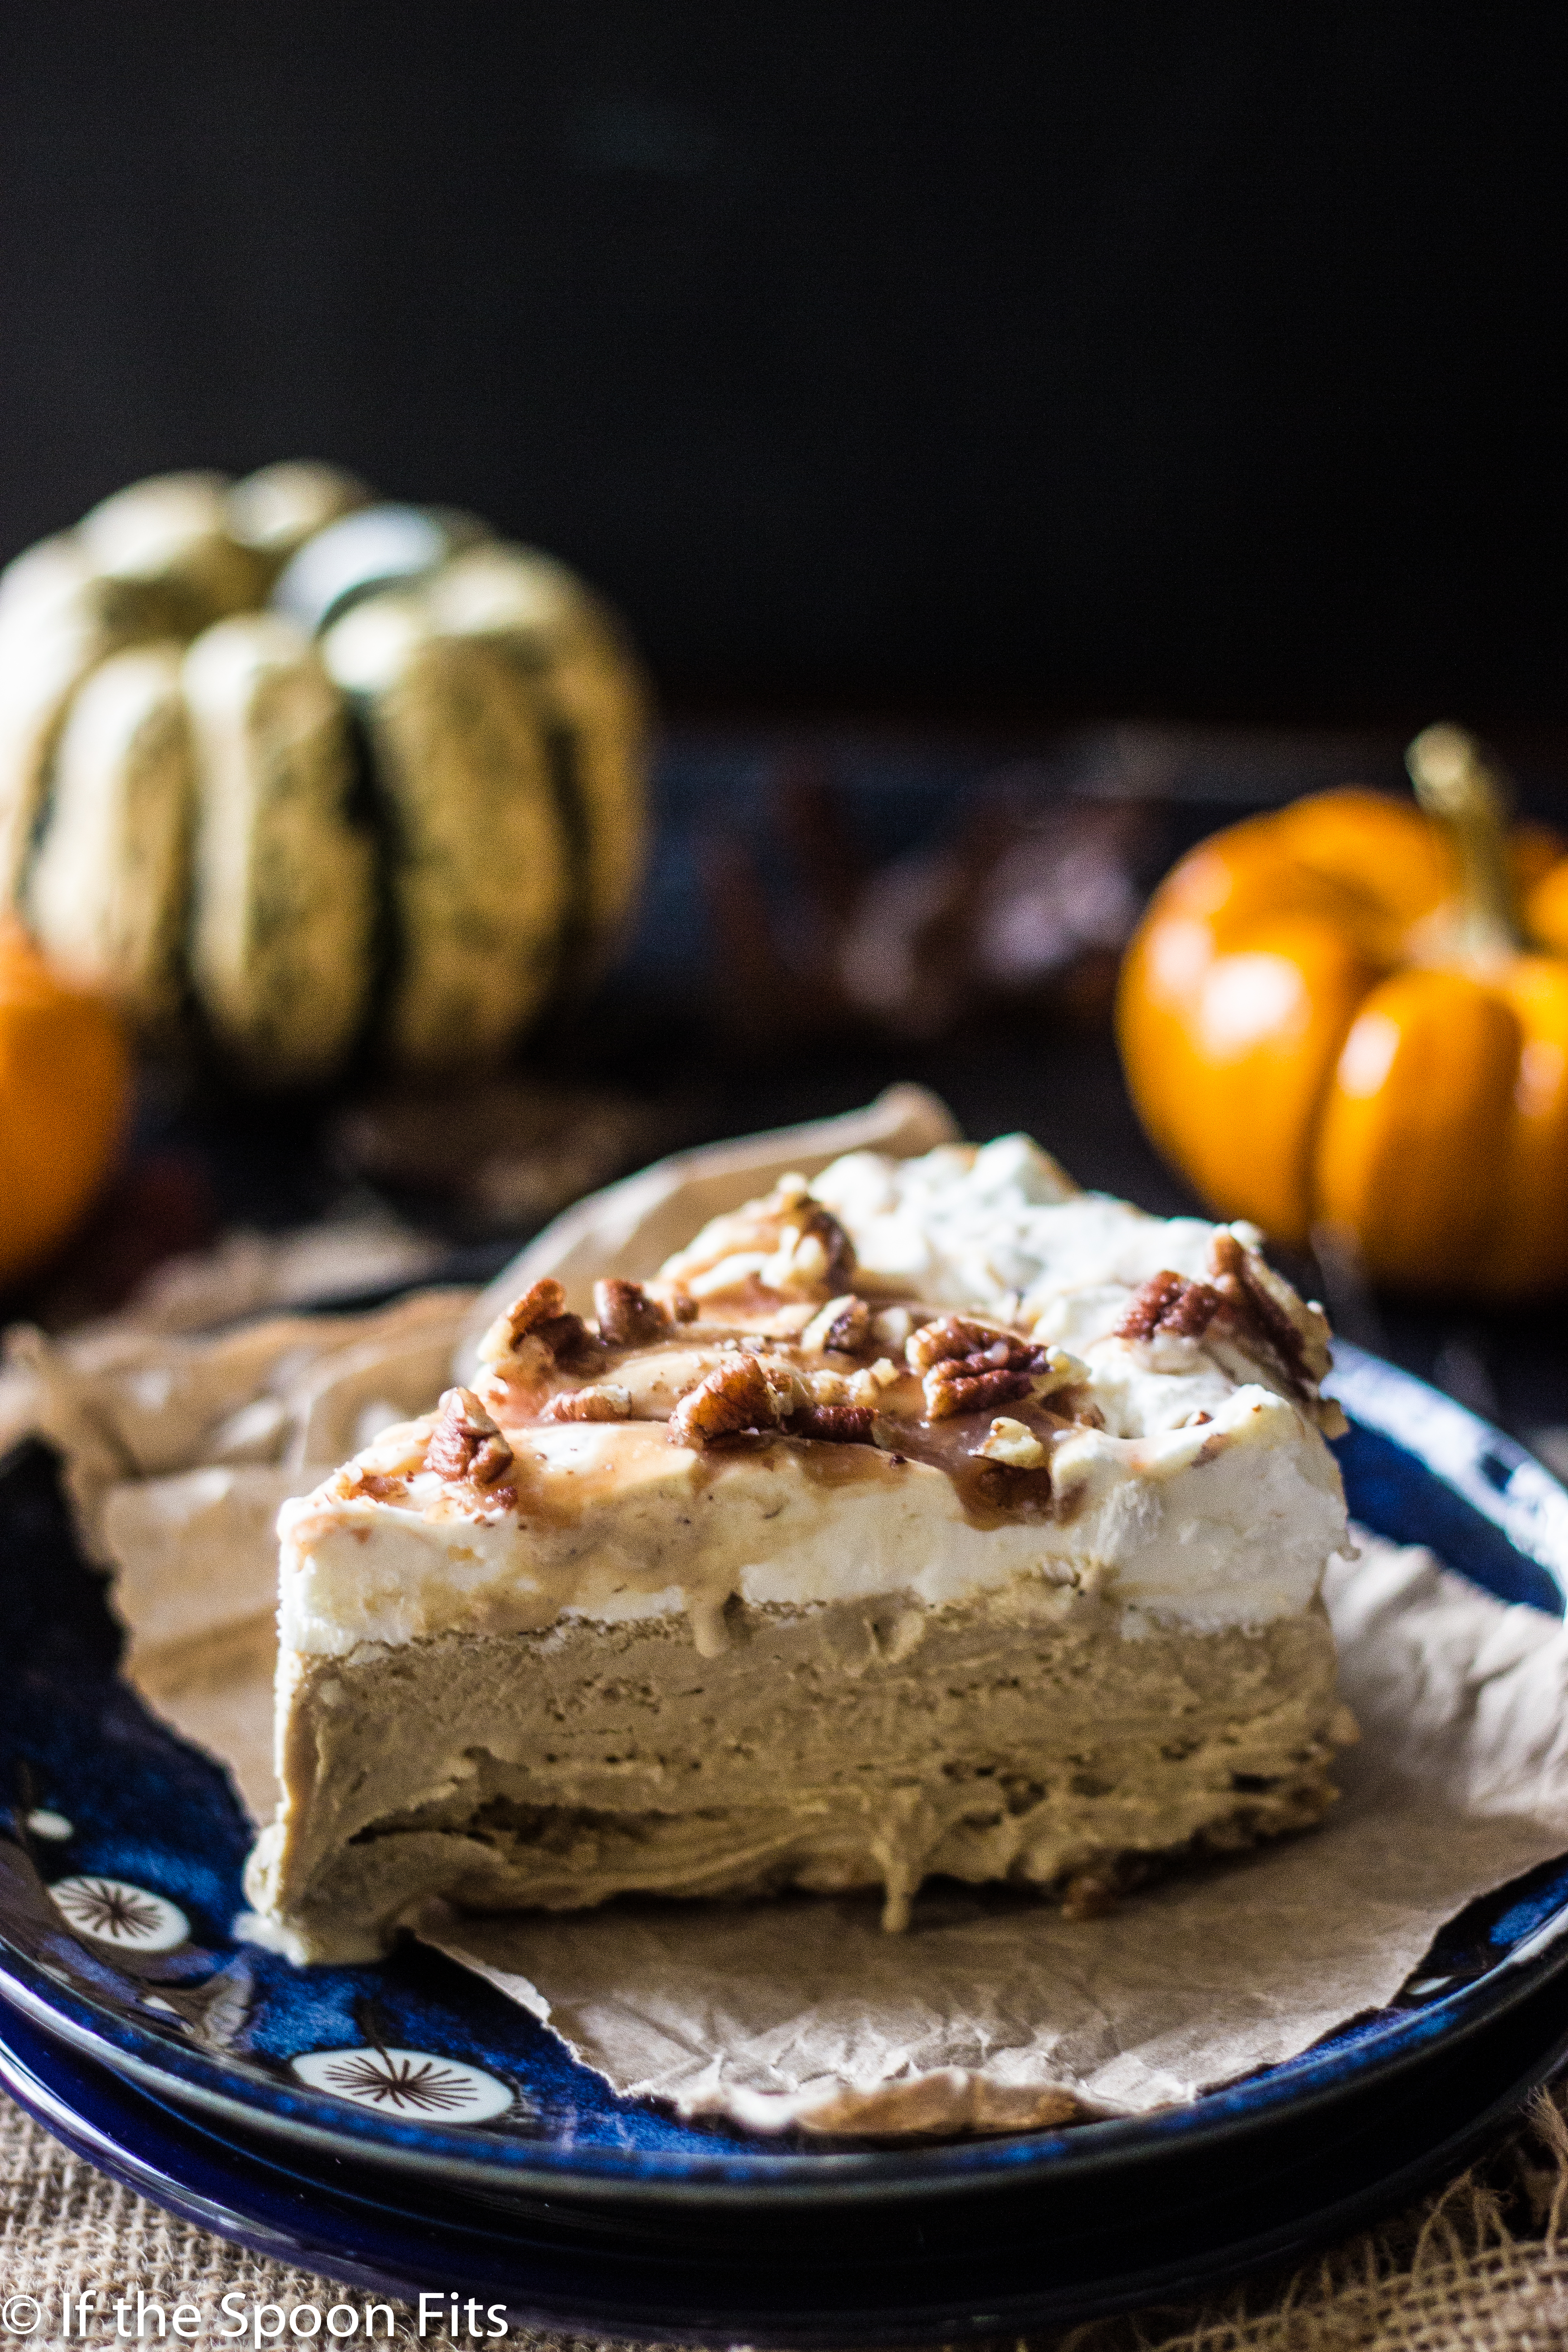 February 2016 Recipes 2016 10 24 Pumpkin Pecan Ice Cream >> Pumpkin Pecan Ice Cream Pie With Salted Bourbon Caramel If The